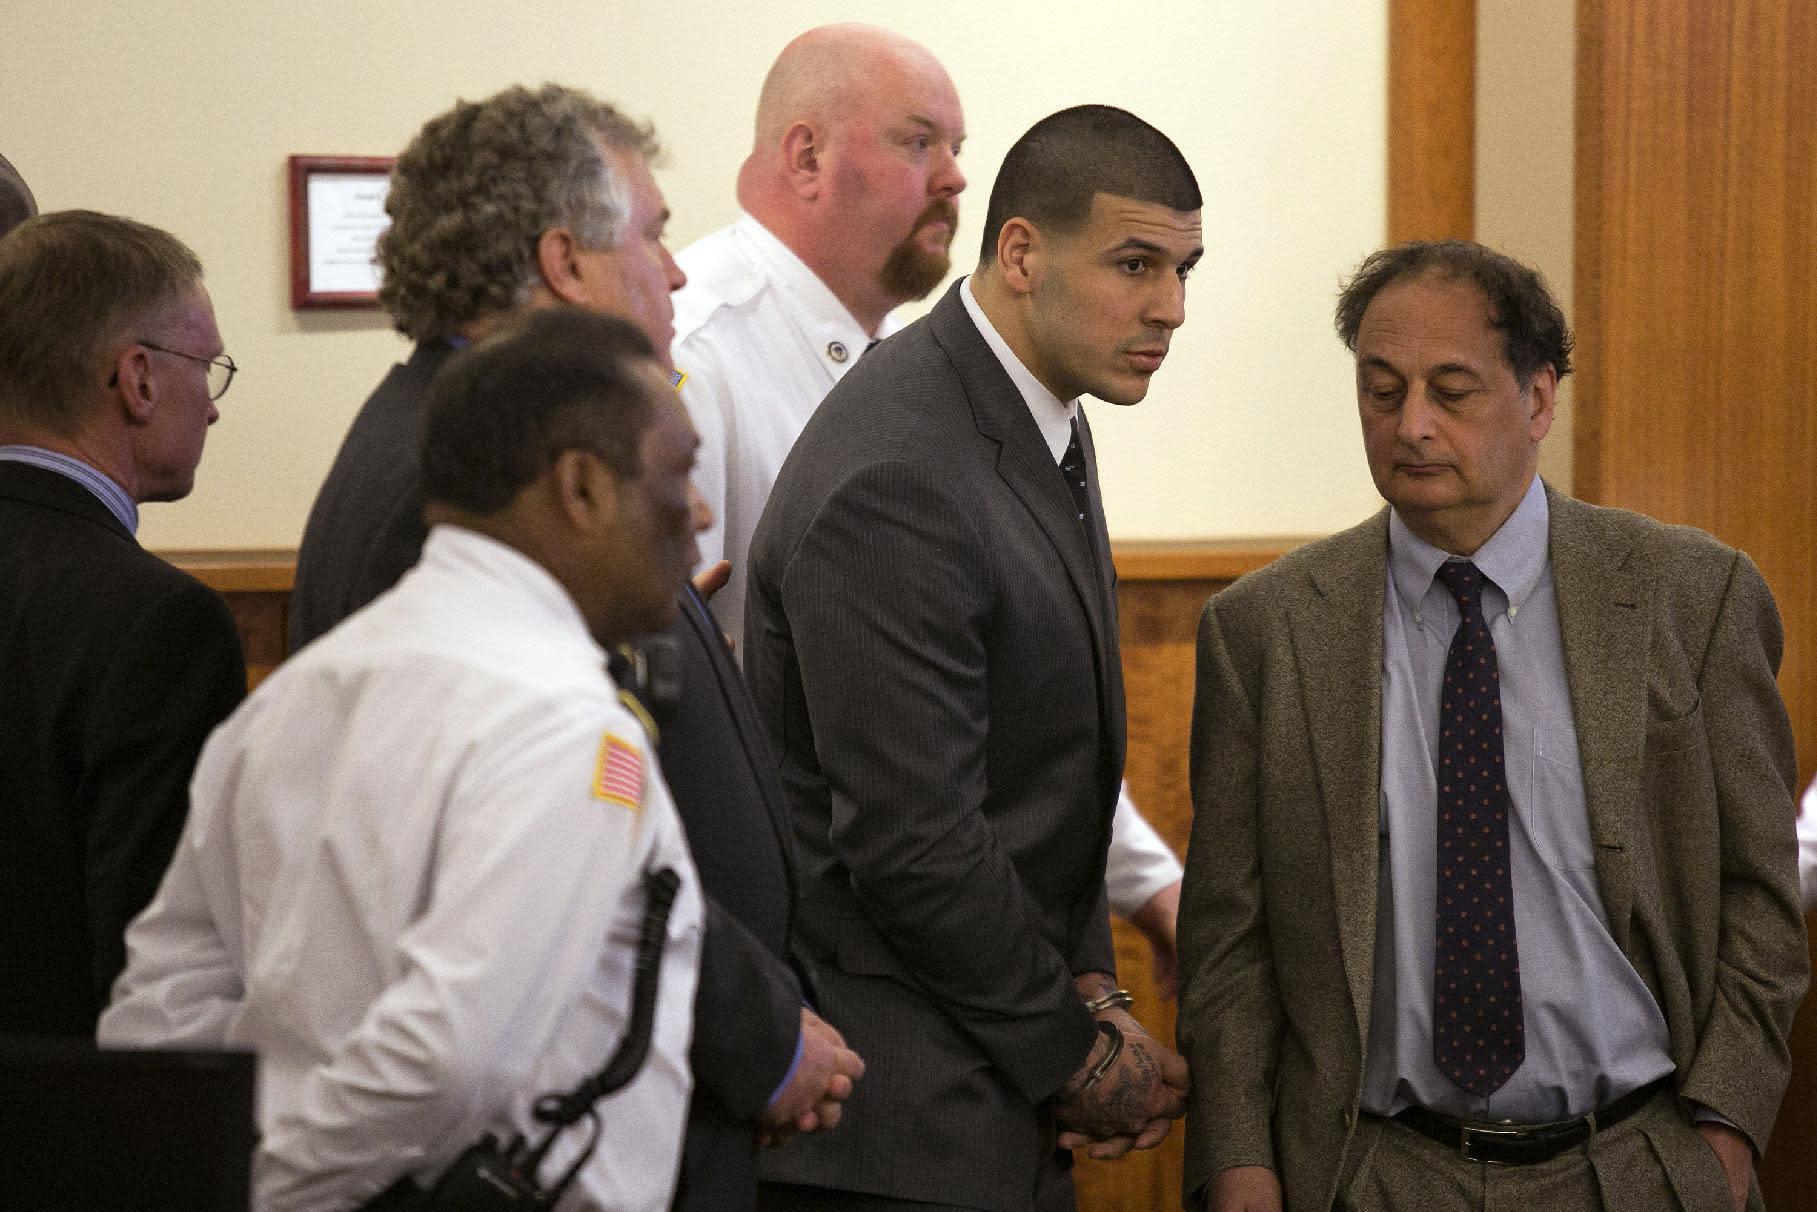 Sheriff: Ex-NFL star Aaron Hernandez is a master manipulator